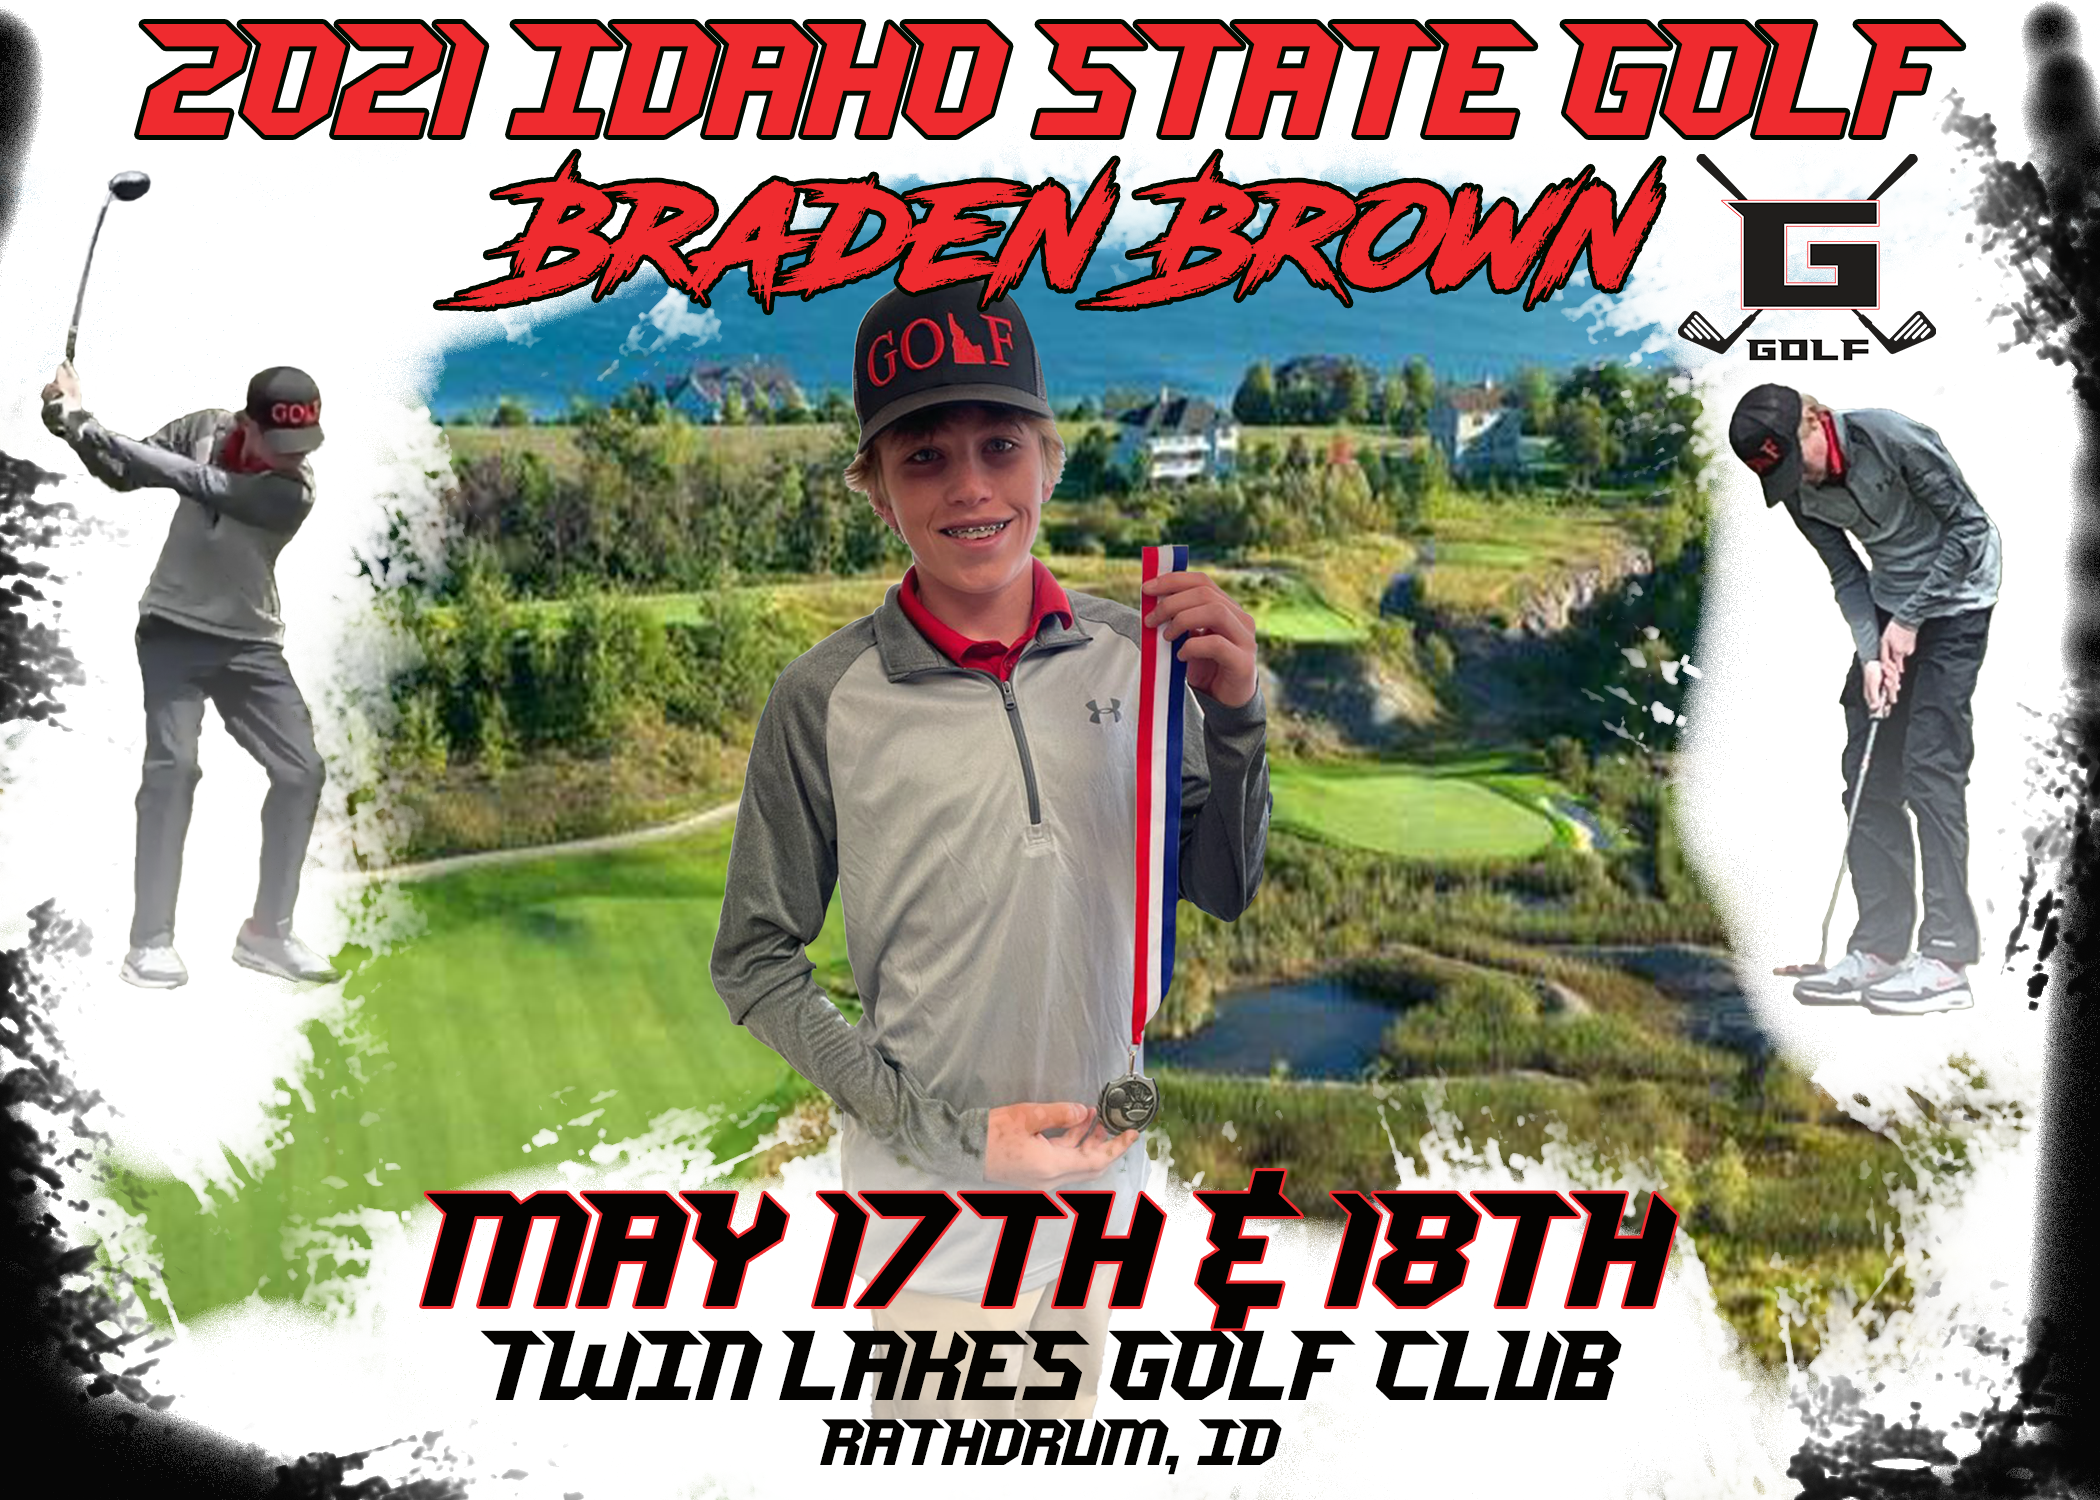 Braden Brown Image to State Golf Tournament 2021